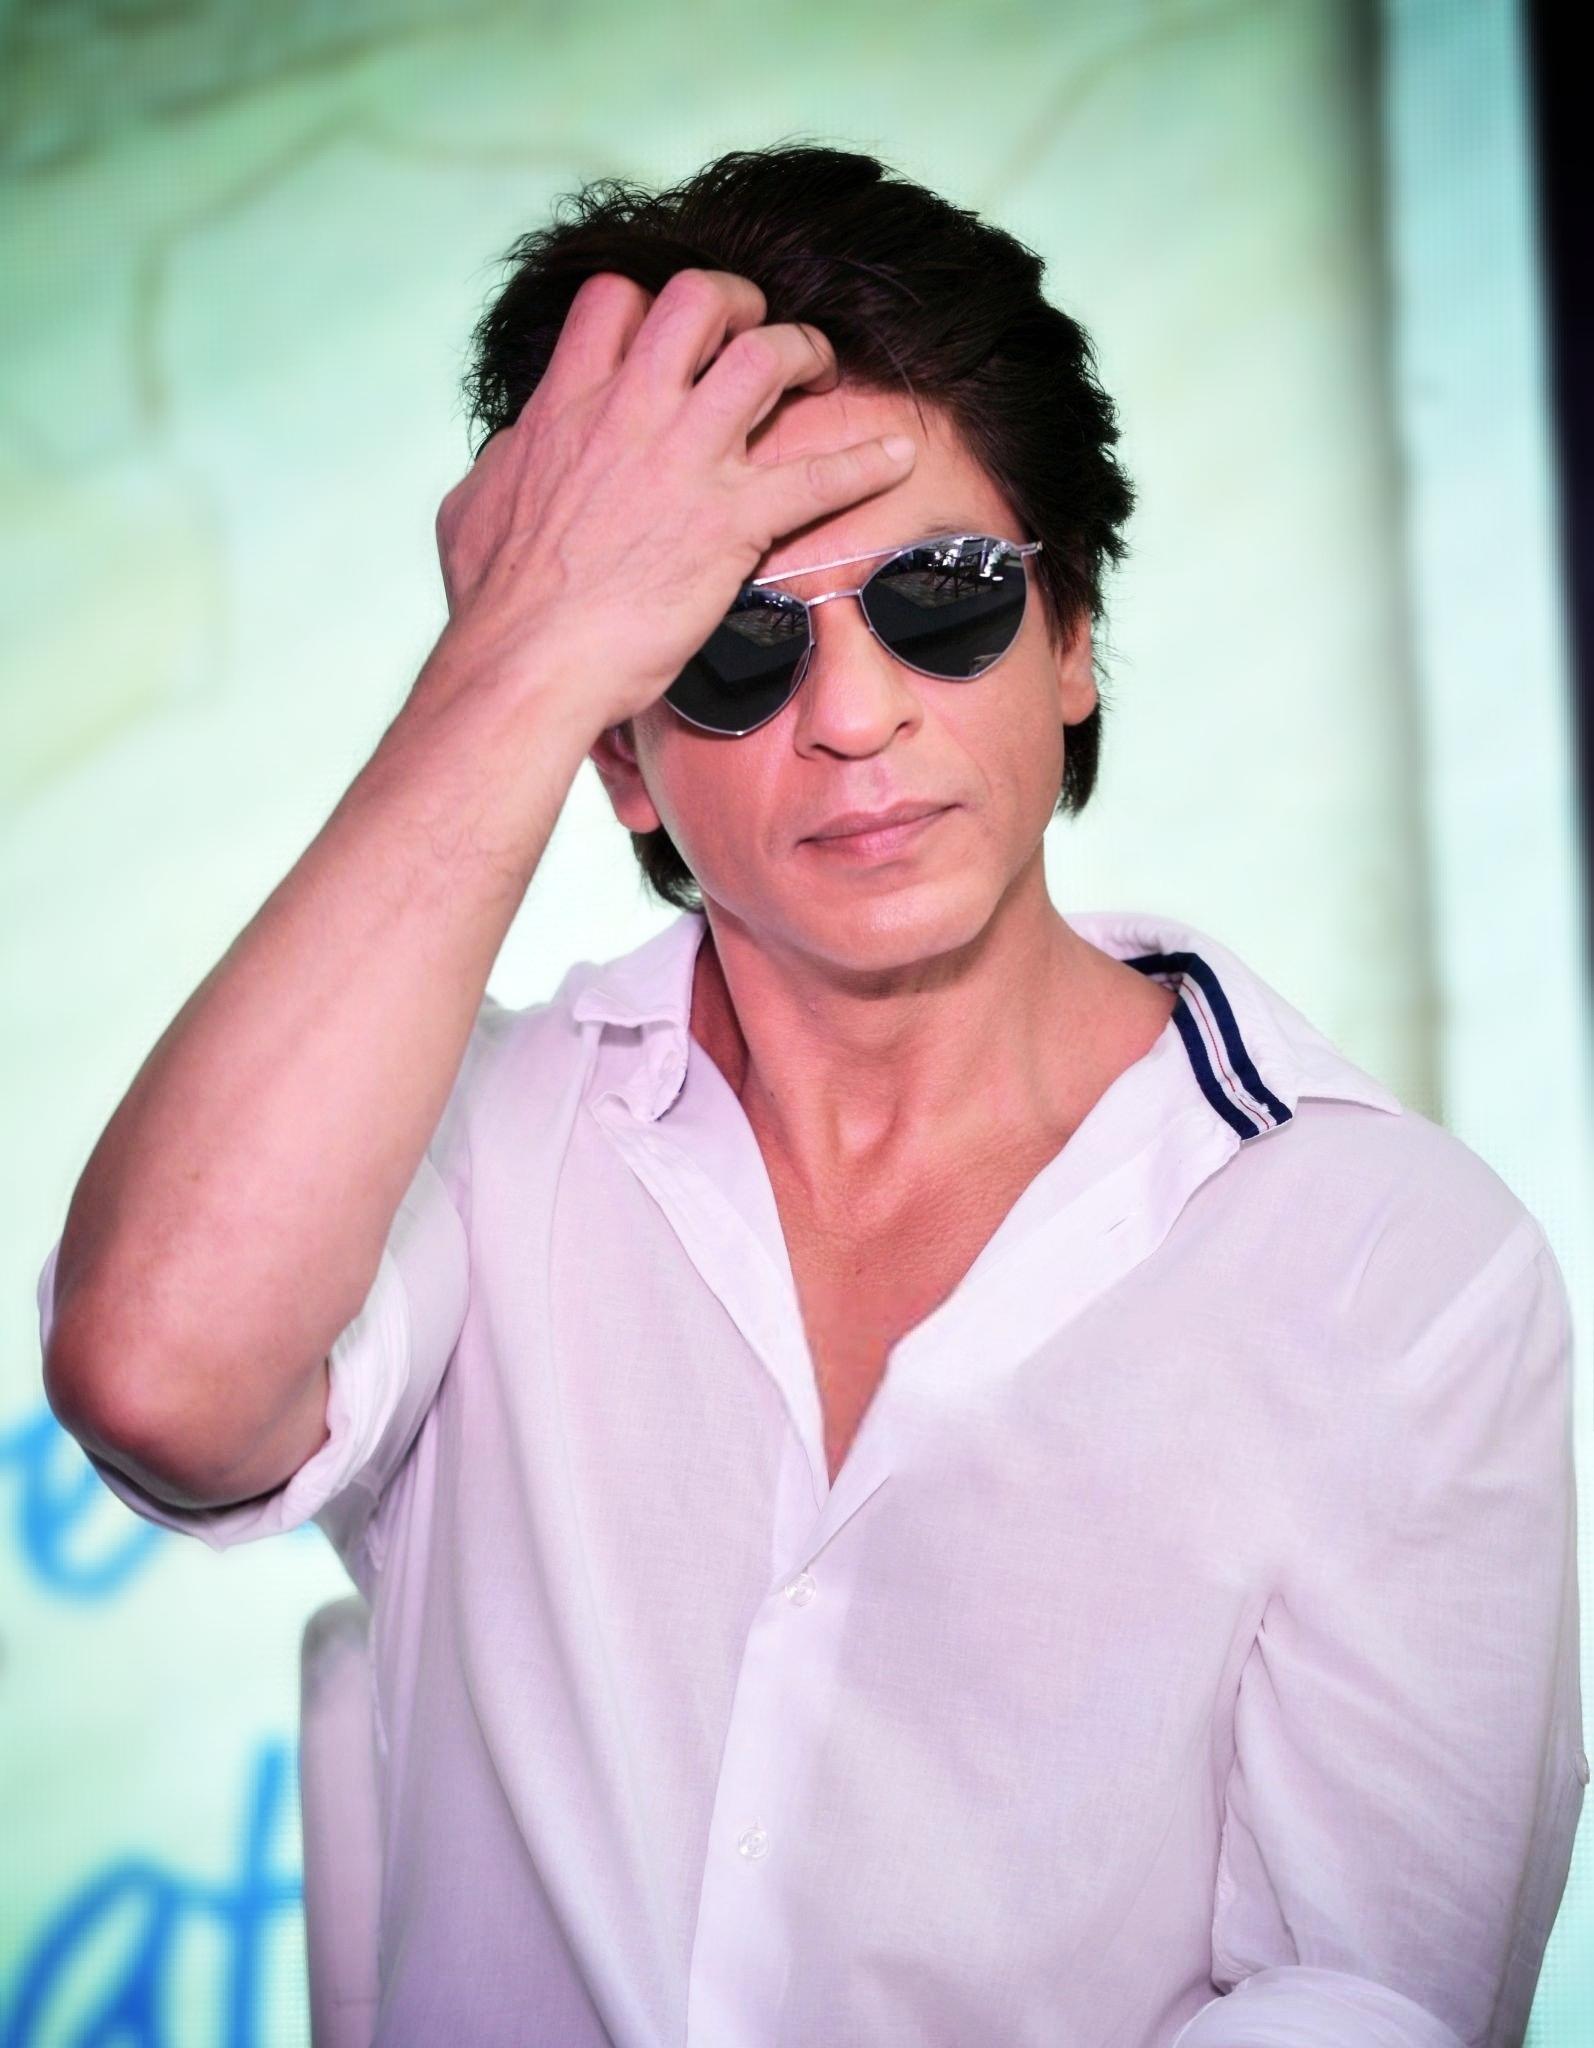 Shah Rukh Khan 2020 by rizuCreation on DeviantArt